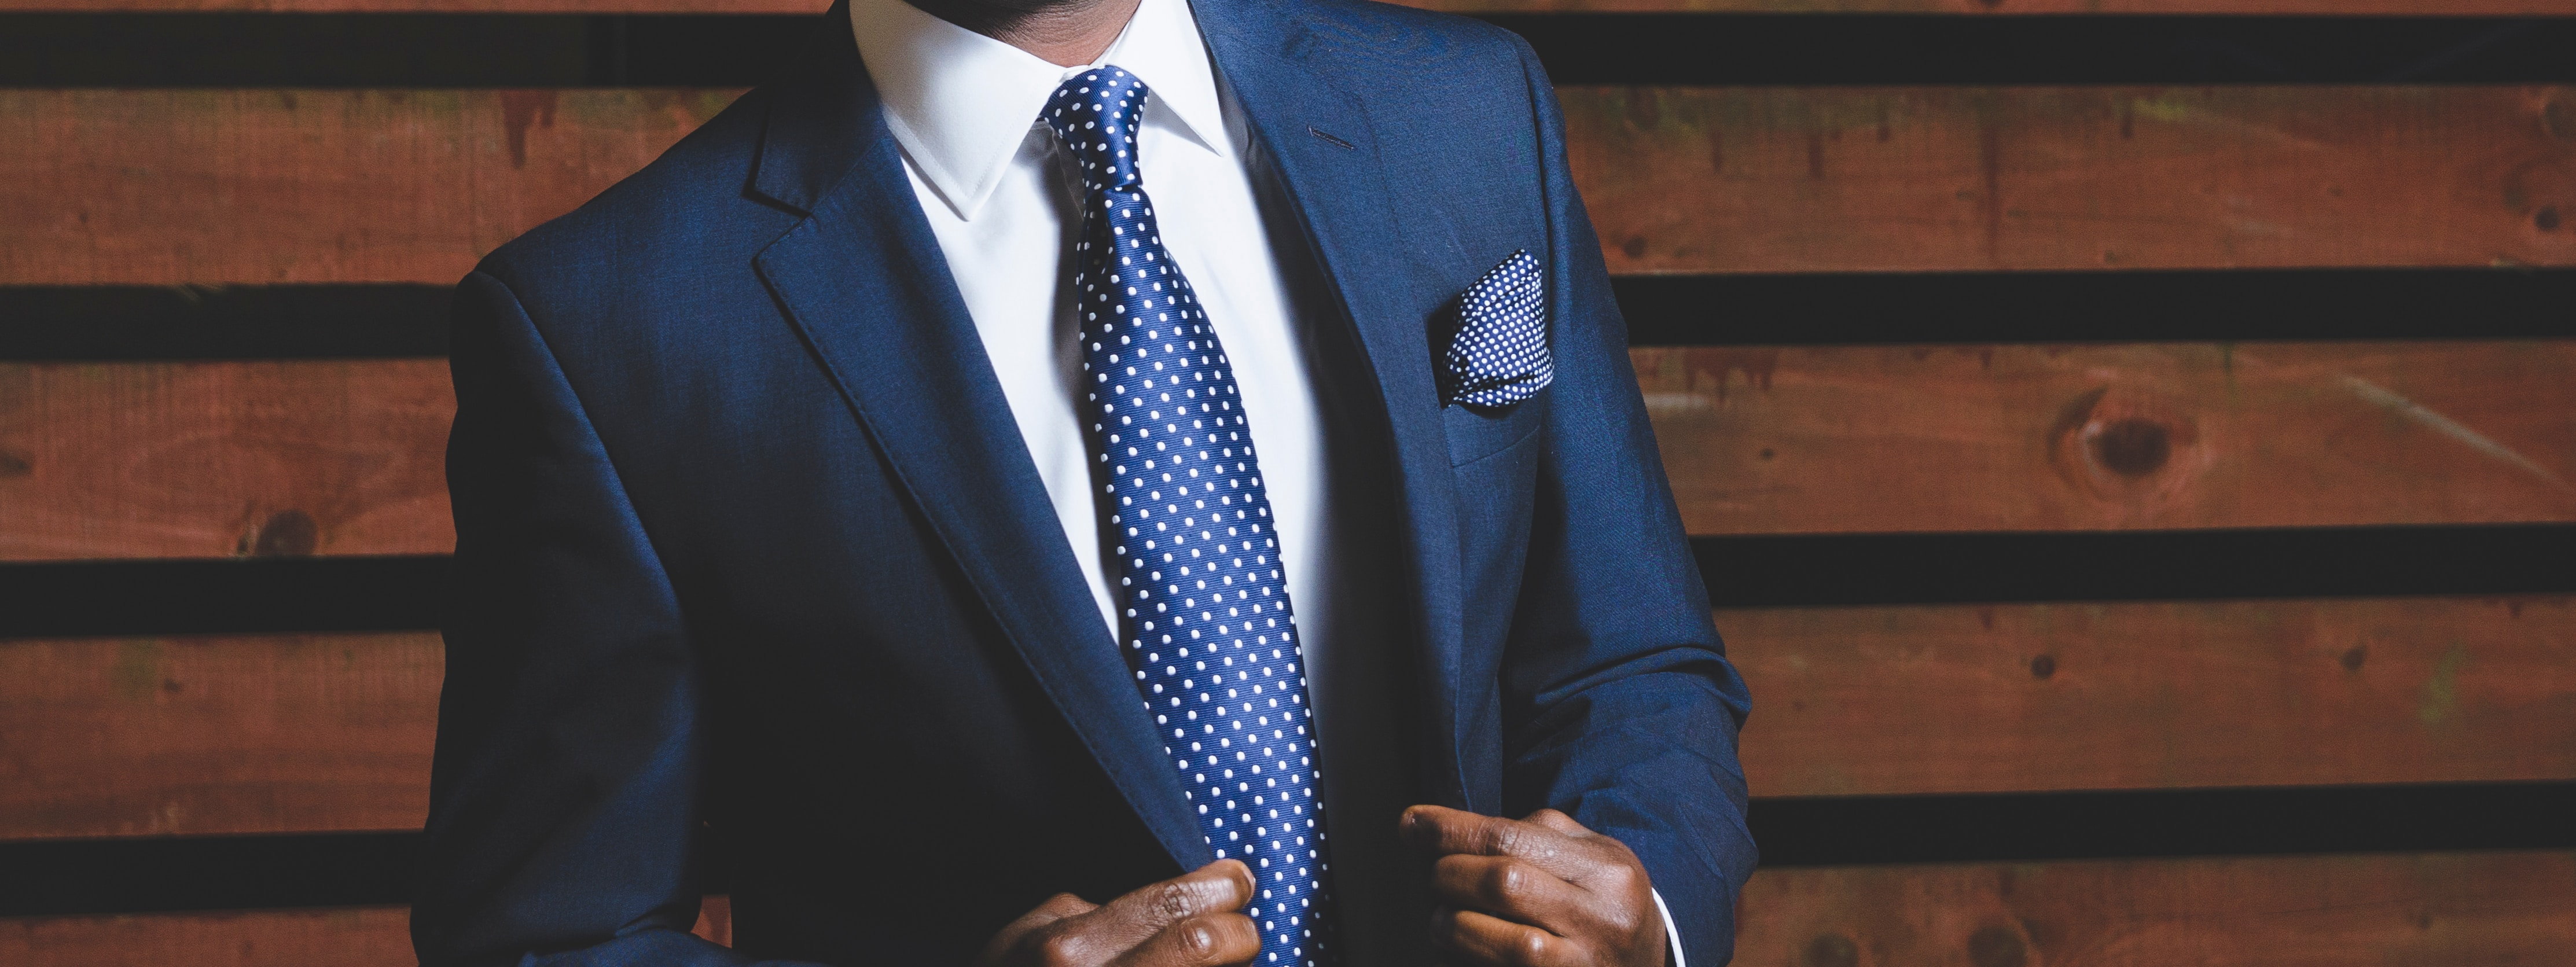 The Best Groom Attire For Summer Weddings Mywedding,Dress To Wear At A Wedding Guest